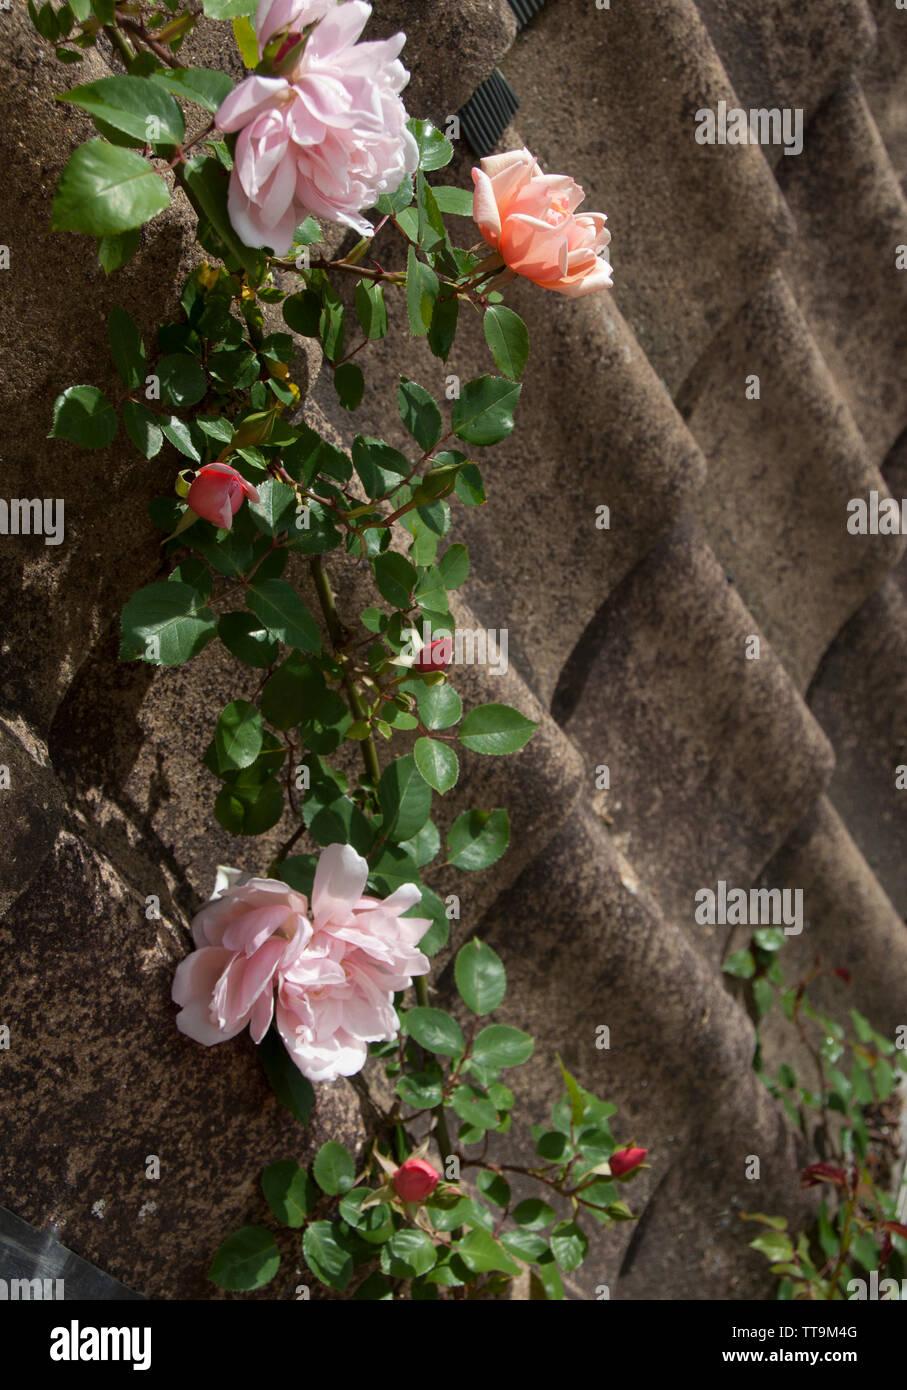 Rosa 'New Dawn' on pantiles - Stock Image